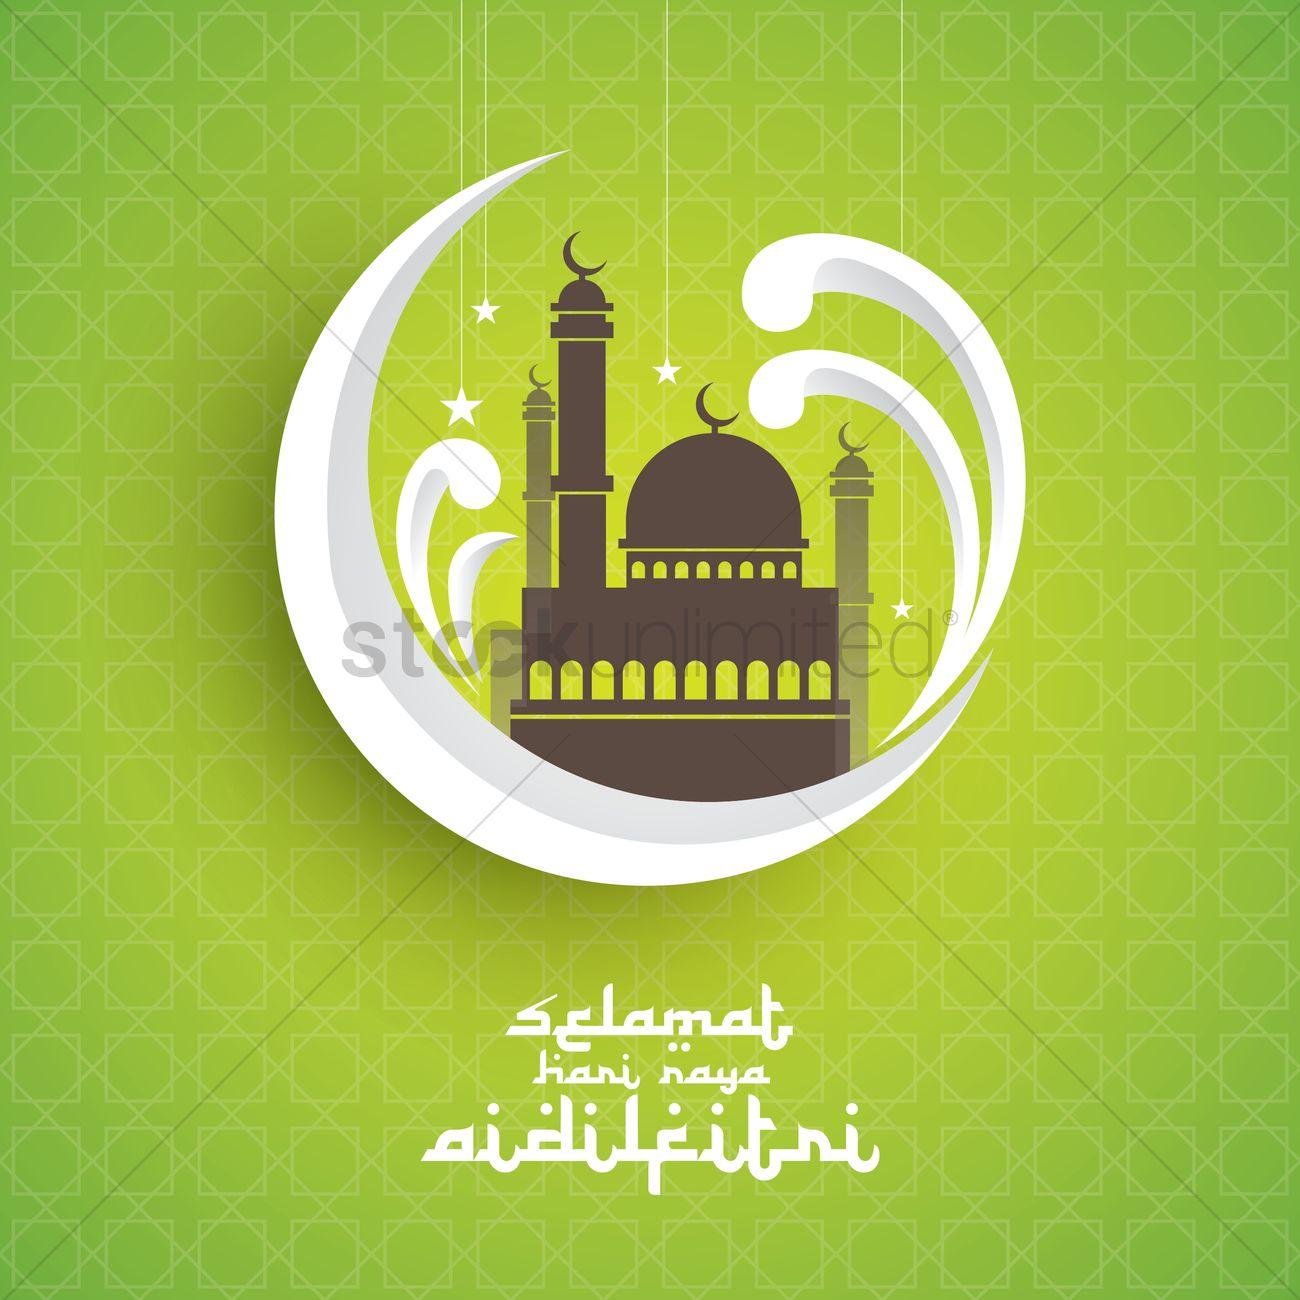 eid festival greeting vector image  1827794  stockunlimited